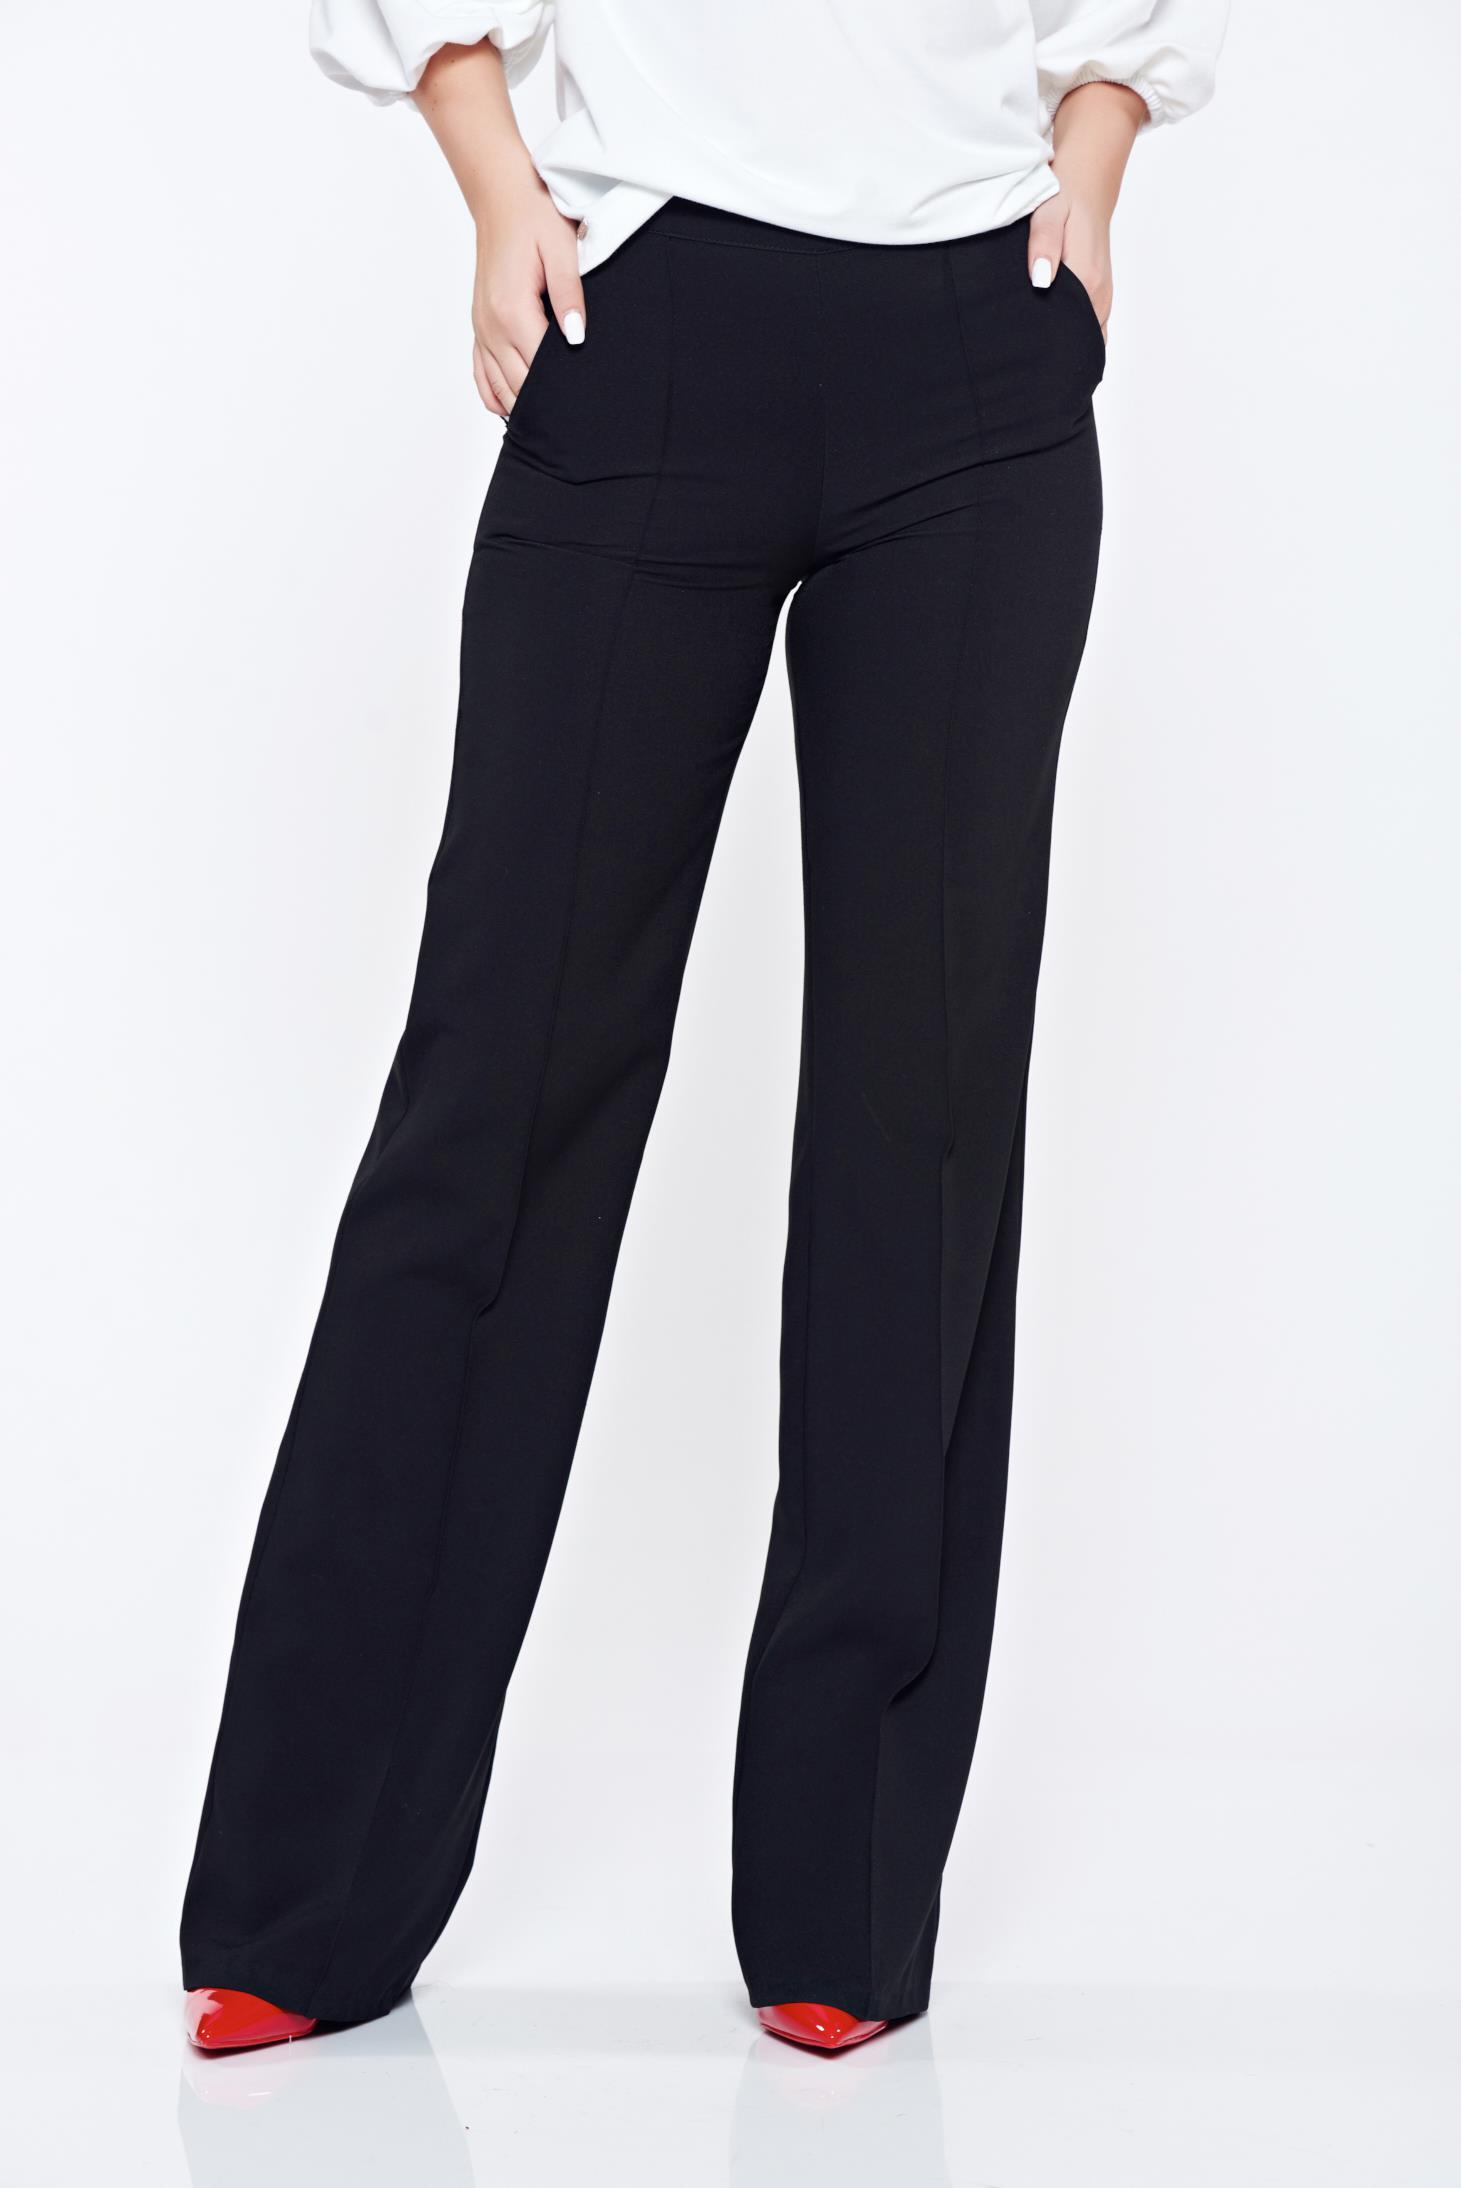 Pantaloni Fofy negri office evazati cu buzunare cu talie medie